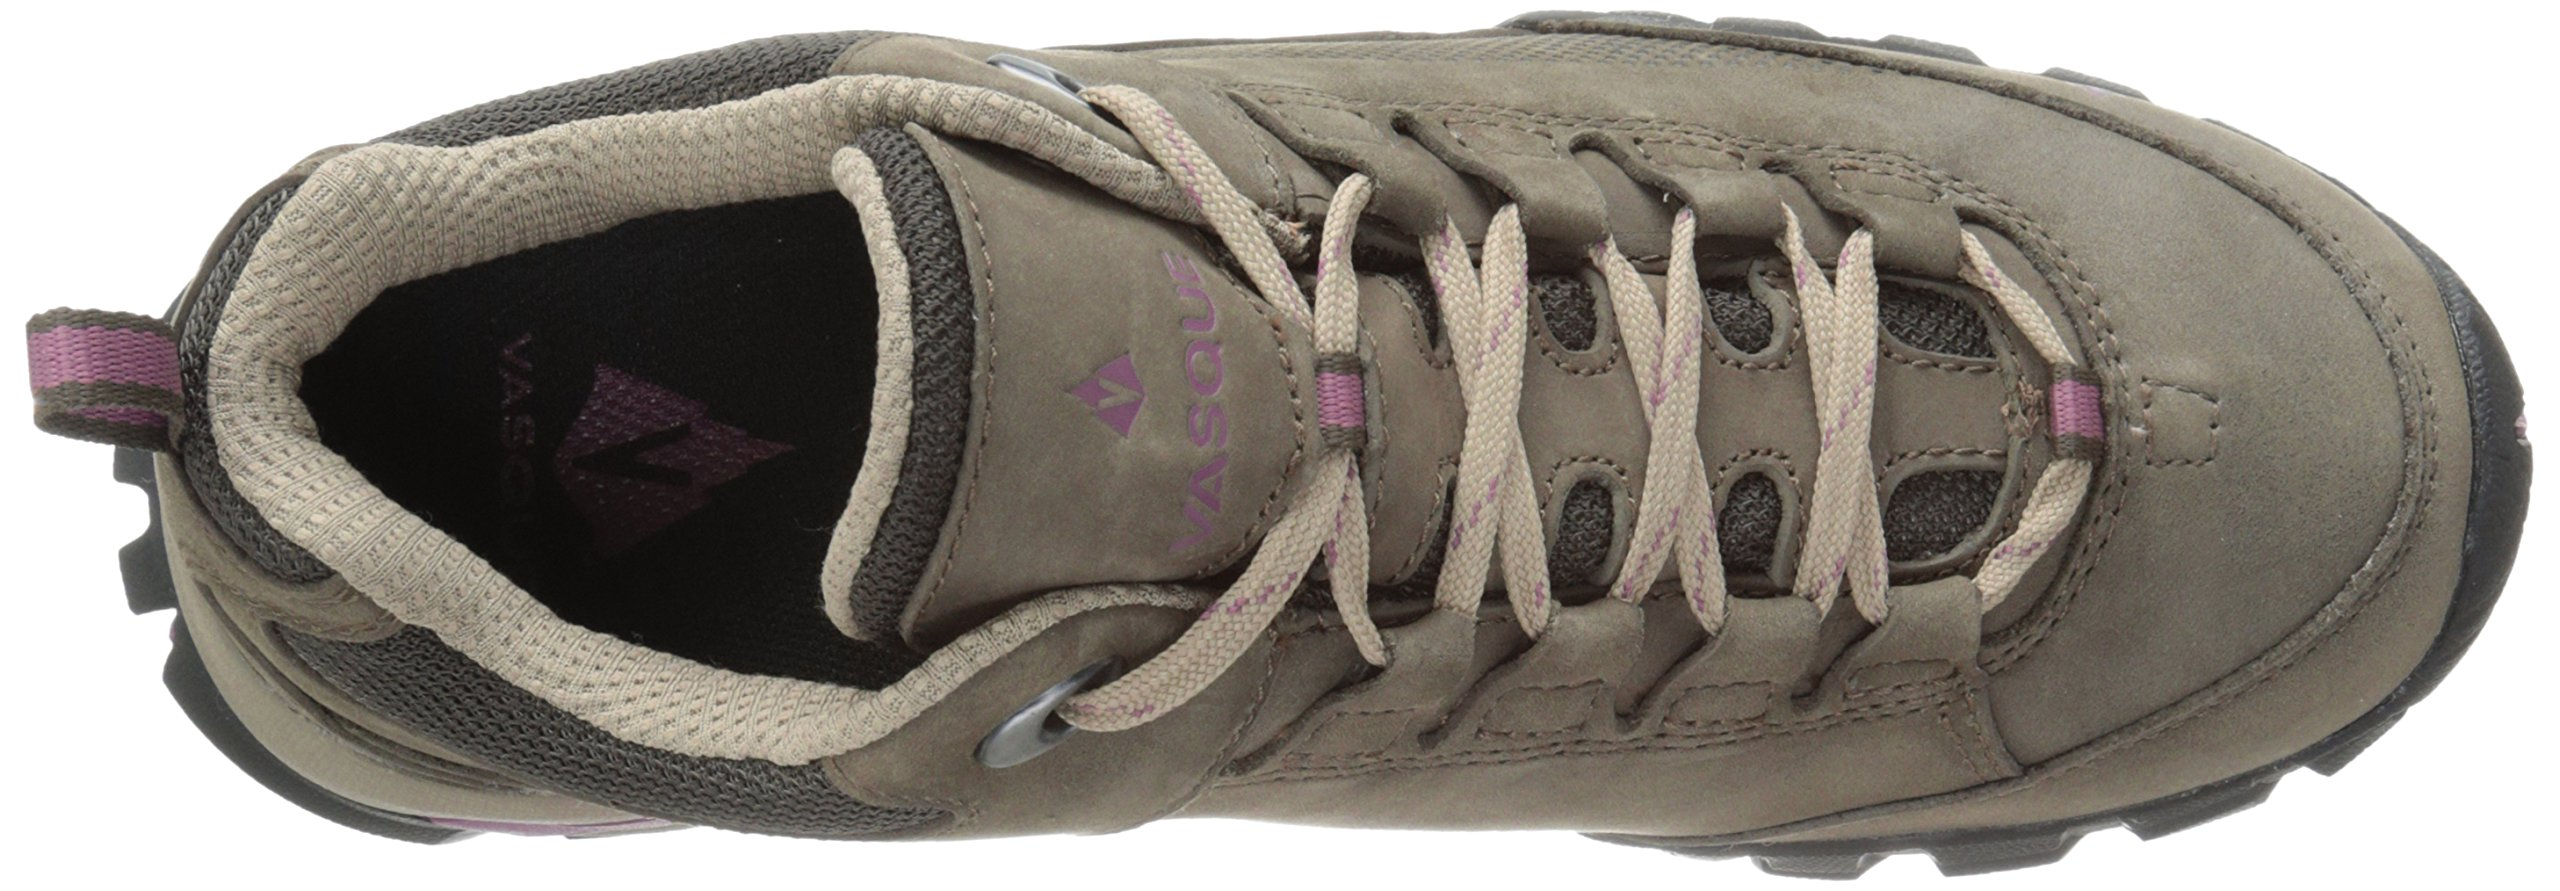 Vasque Women's Talus Trek Low UltraDry Hiking Shoe, Black Olive/Damson, 8.5 M US by Vasque (Image #8)